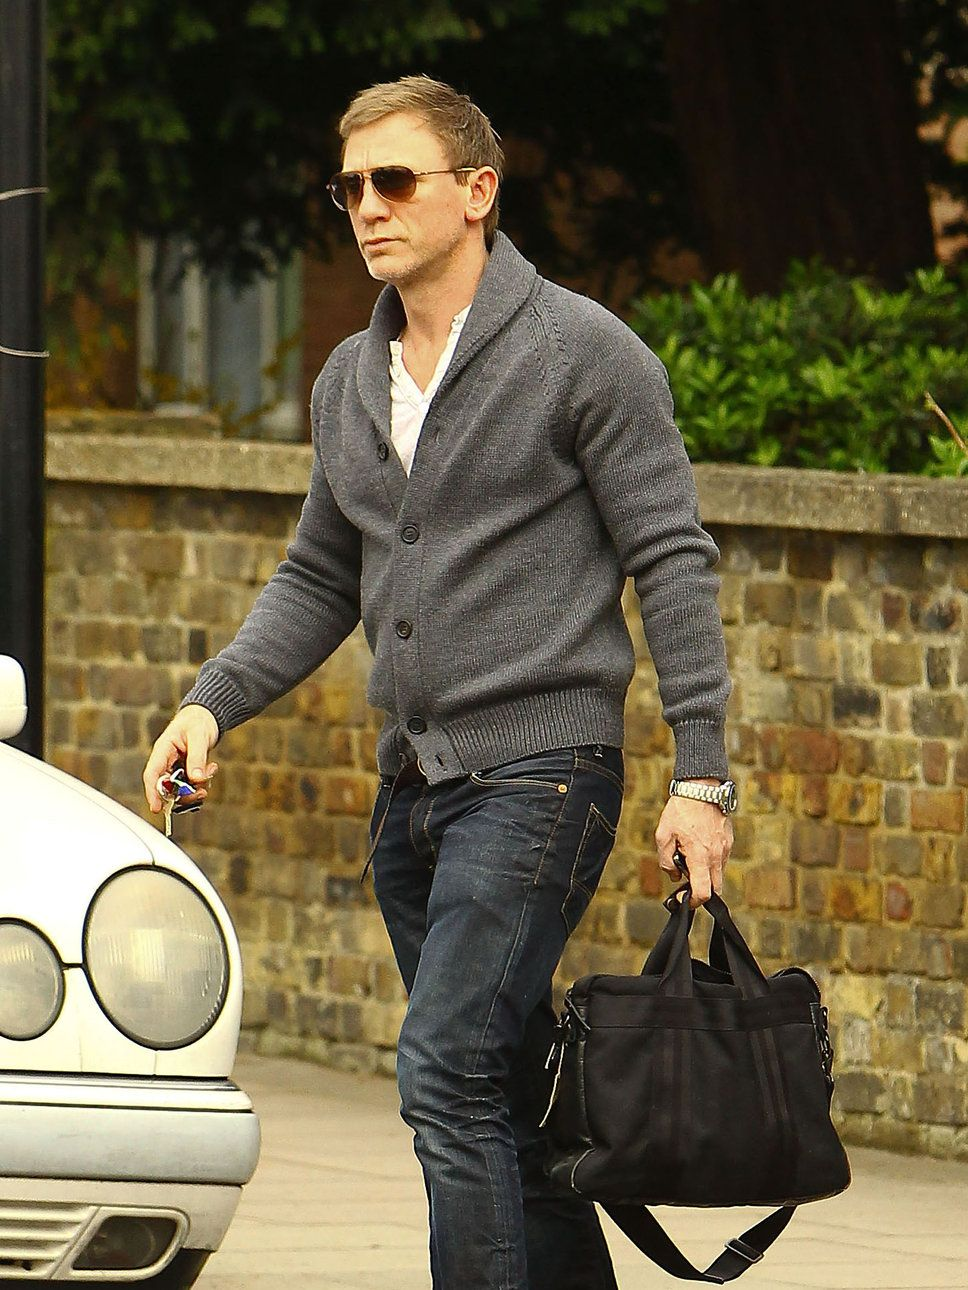 Daniel Craig Sweater Sunglasses Bag Photo Posh24 Com ダニエルクレイグ ダニエル クレイグ